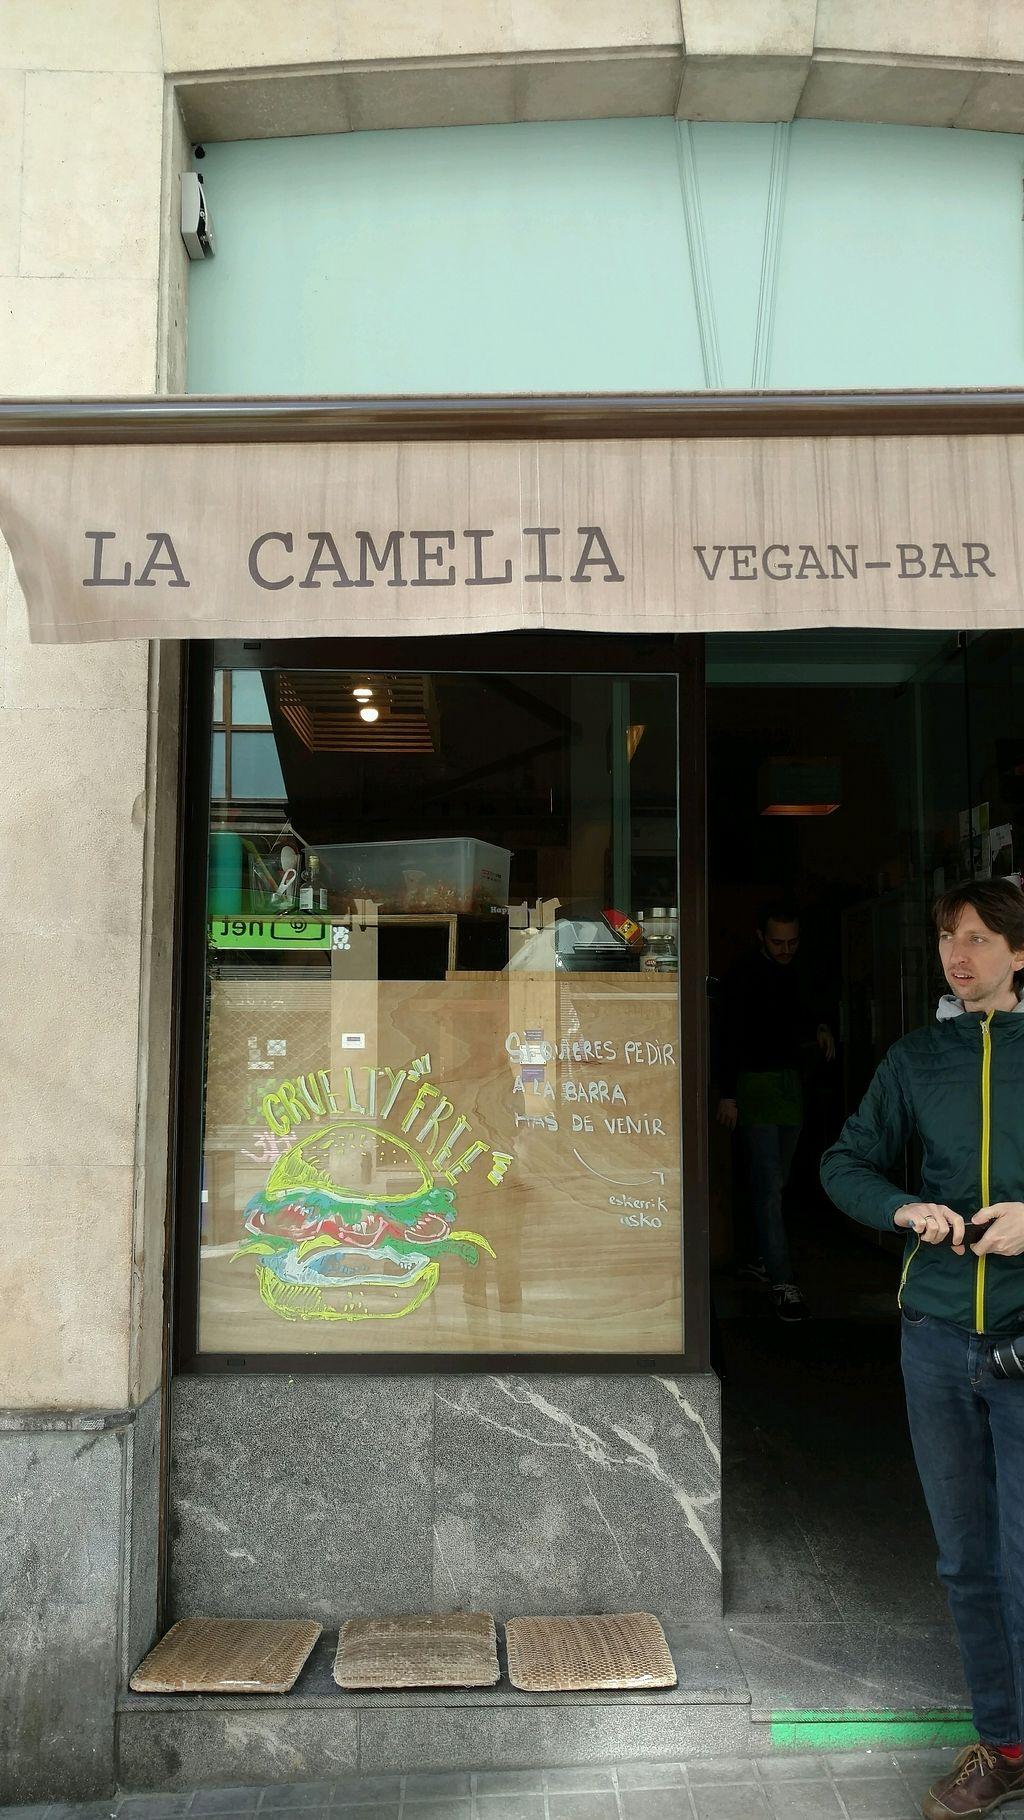 "Photo of La Camelia Vegan Bar  by <a href=""/members/profile/vineeta9"">vineeta9</a> <br/>entrance <br/> March 30, 2018  - <a href='/contact/abuse/image/57833/378333'>Report</a>"